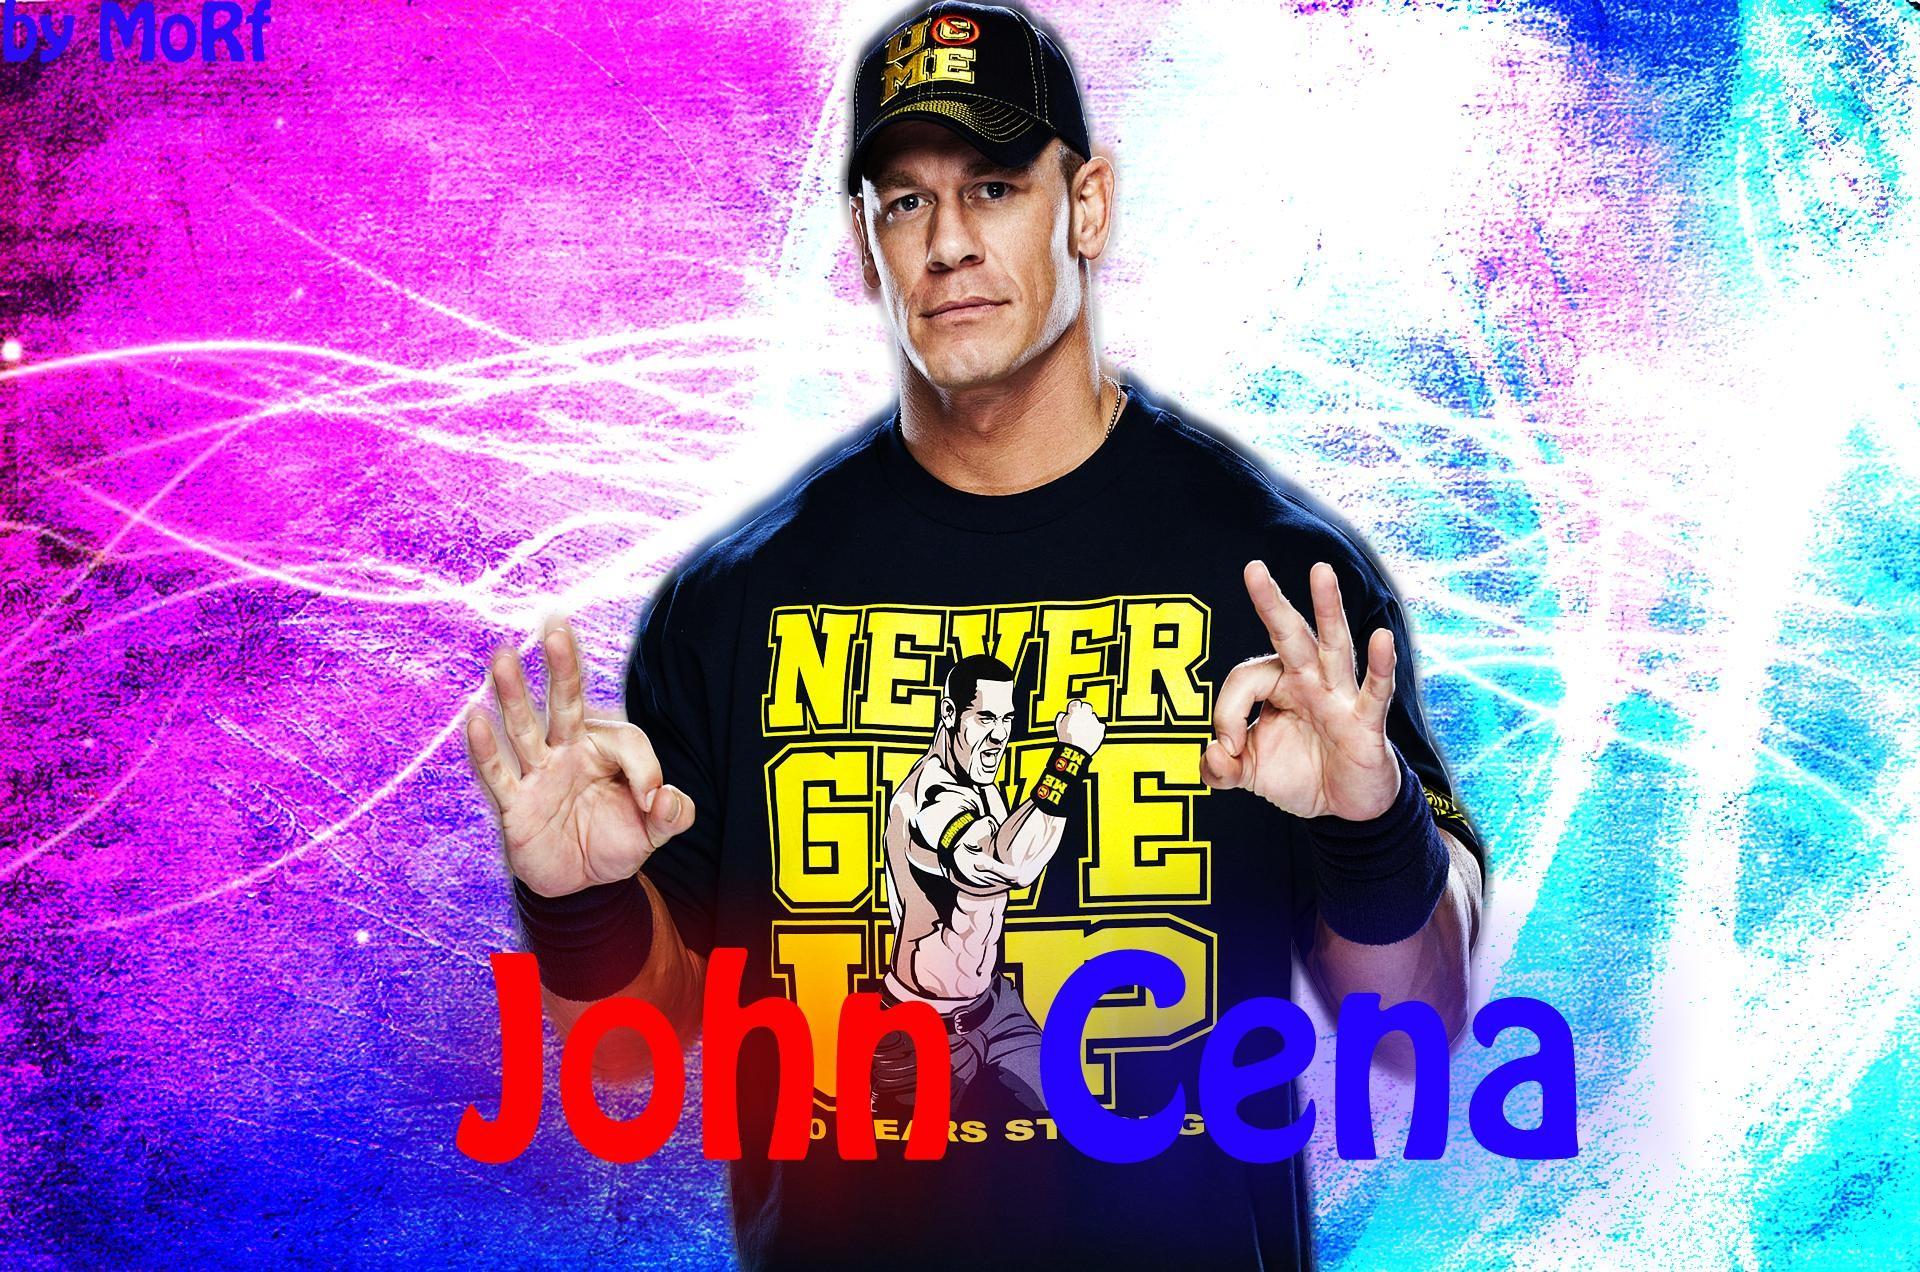 John Cena wallpapers – WWE Photo (33276573) – Fanpop